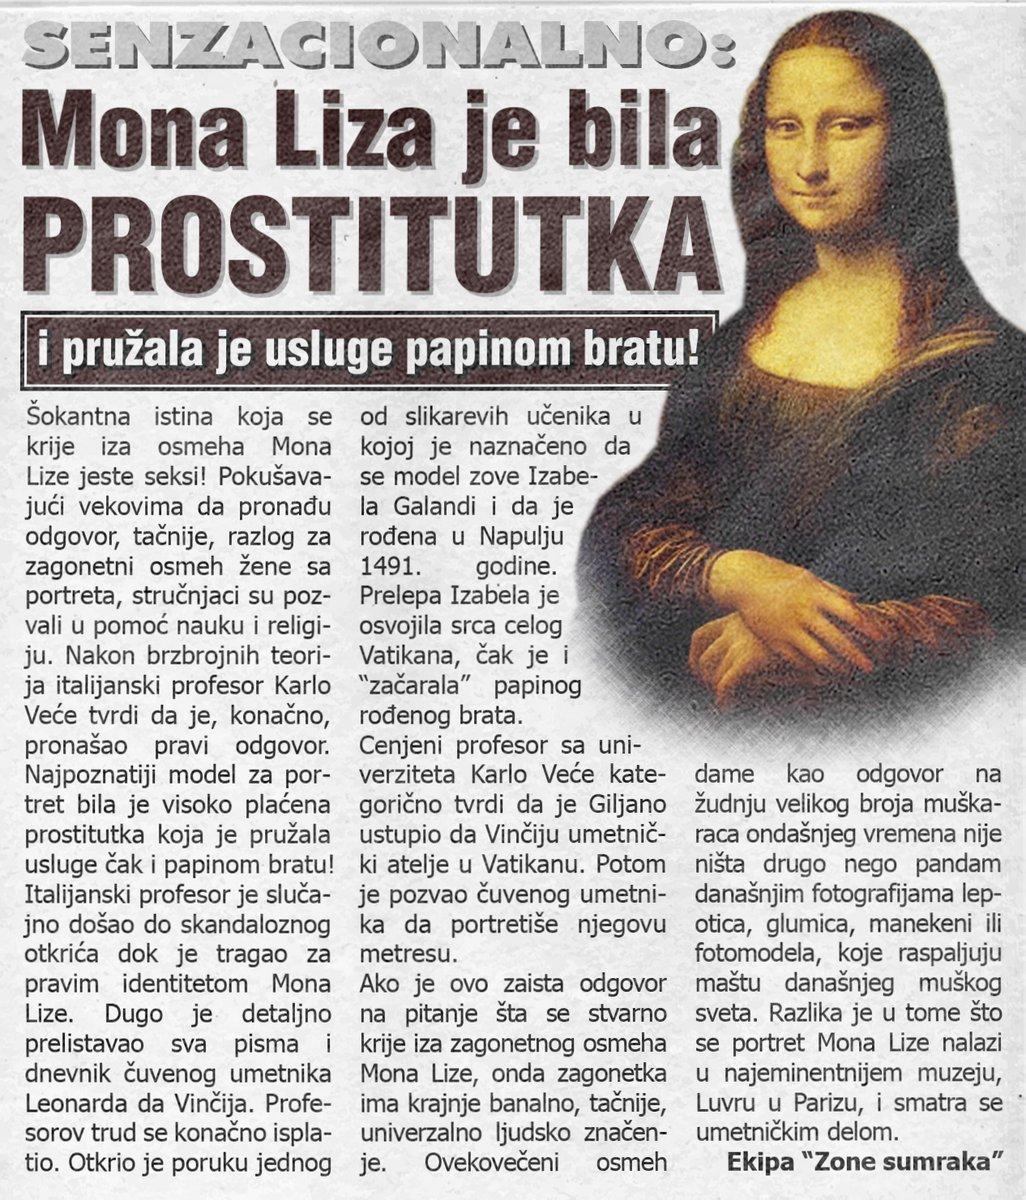 Mona Liza je bila prostitutka